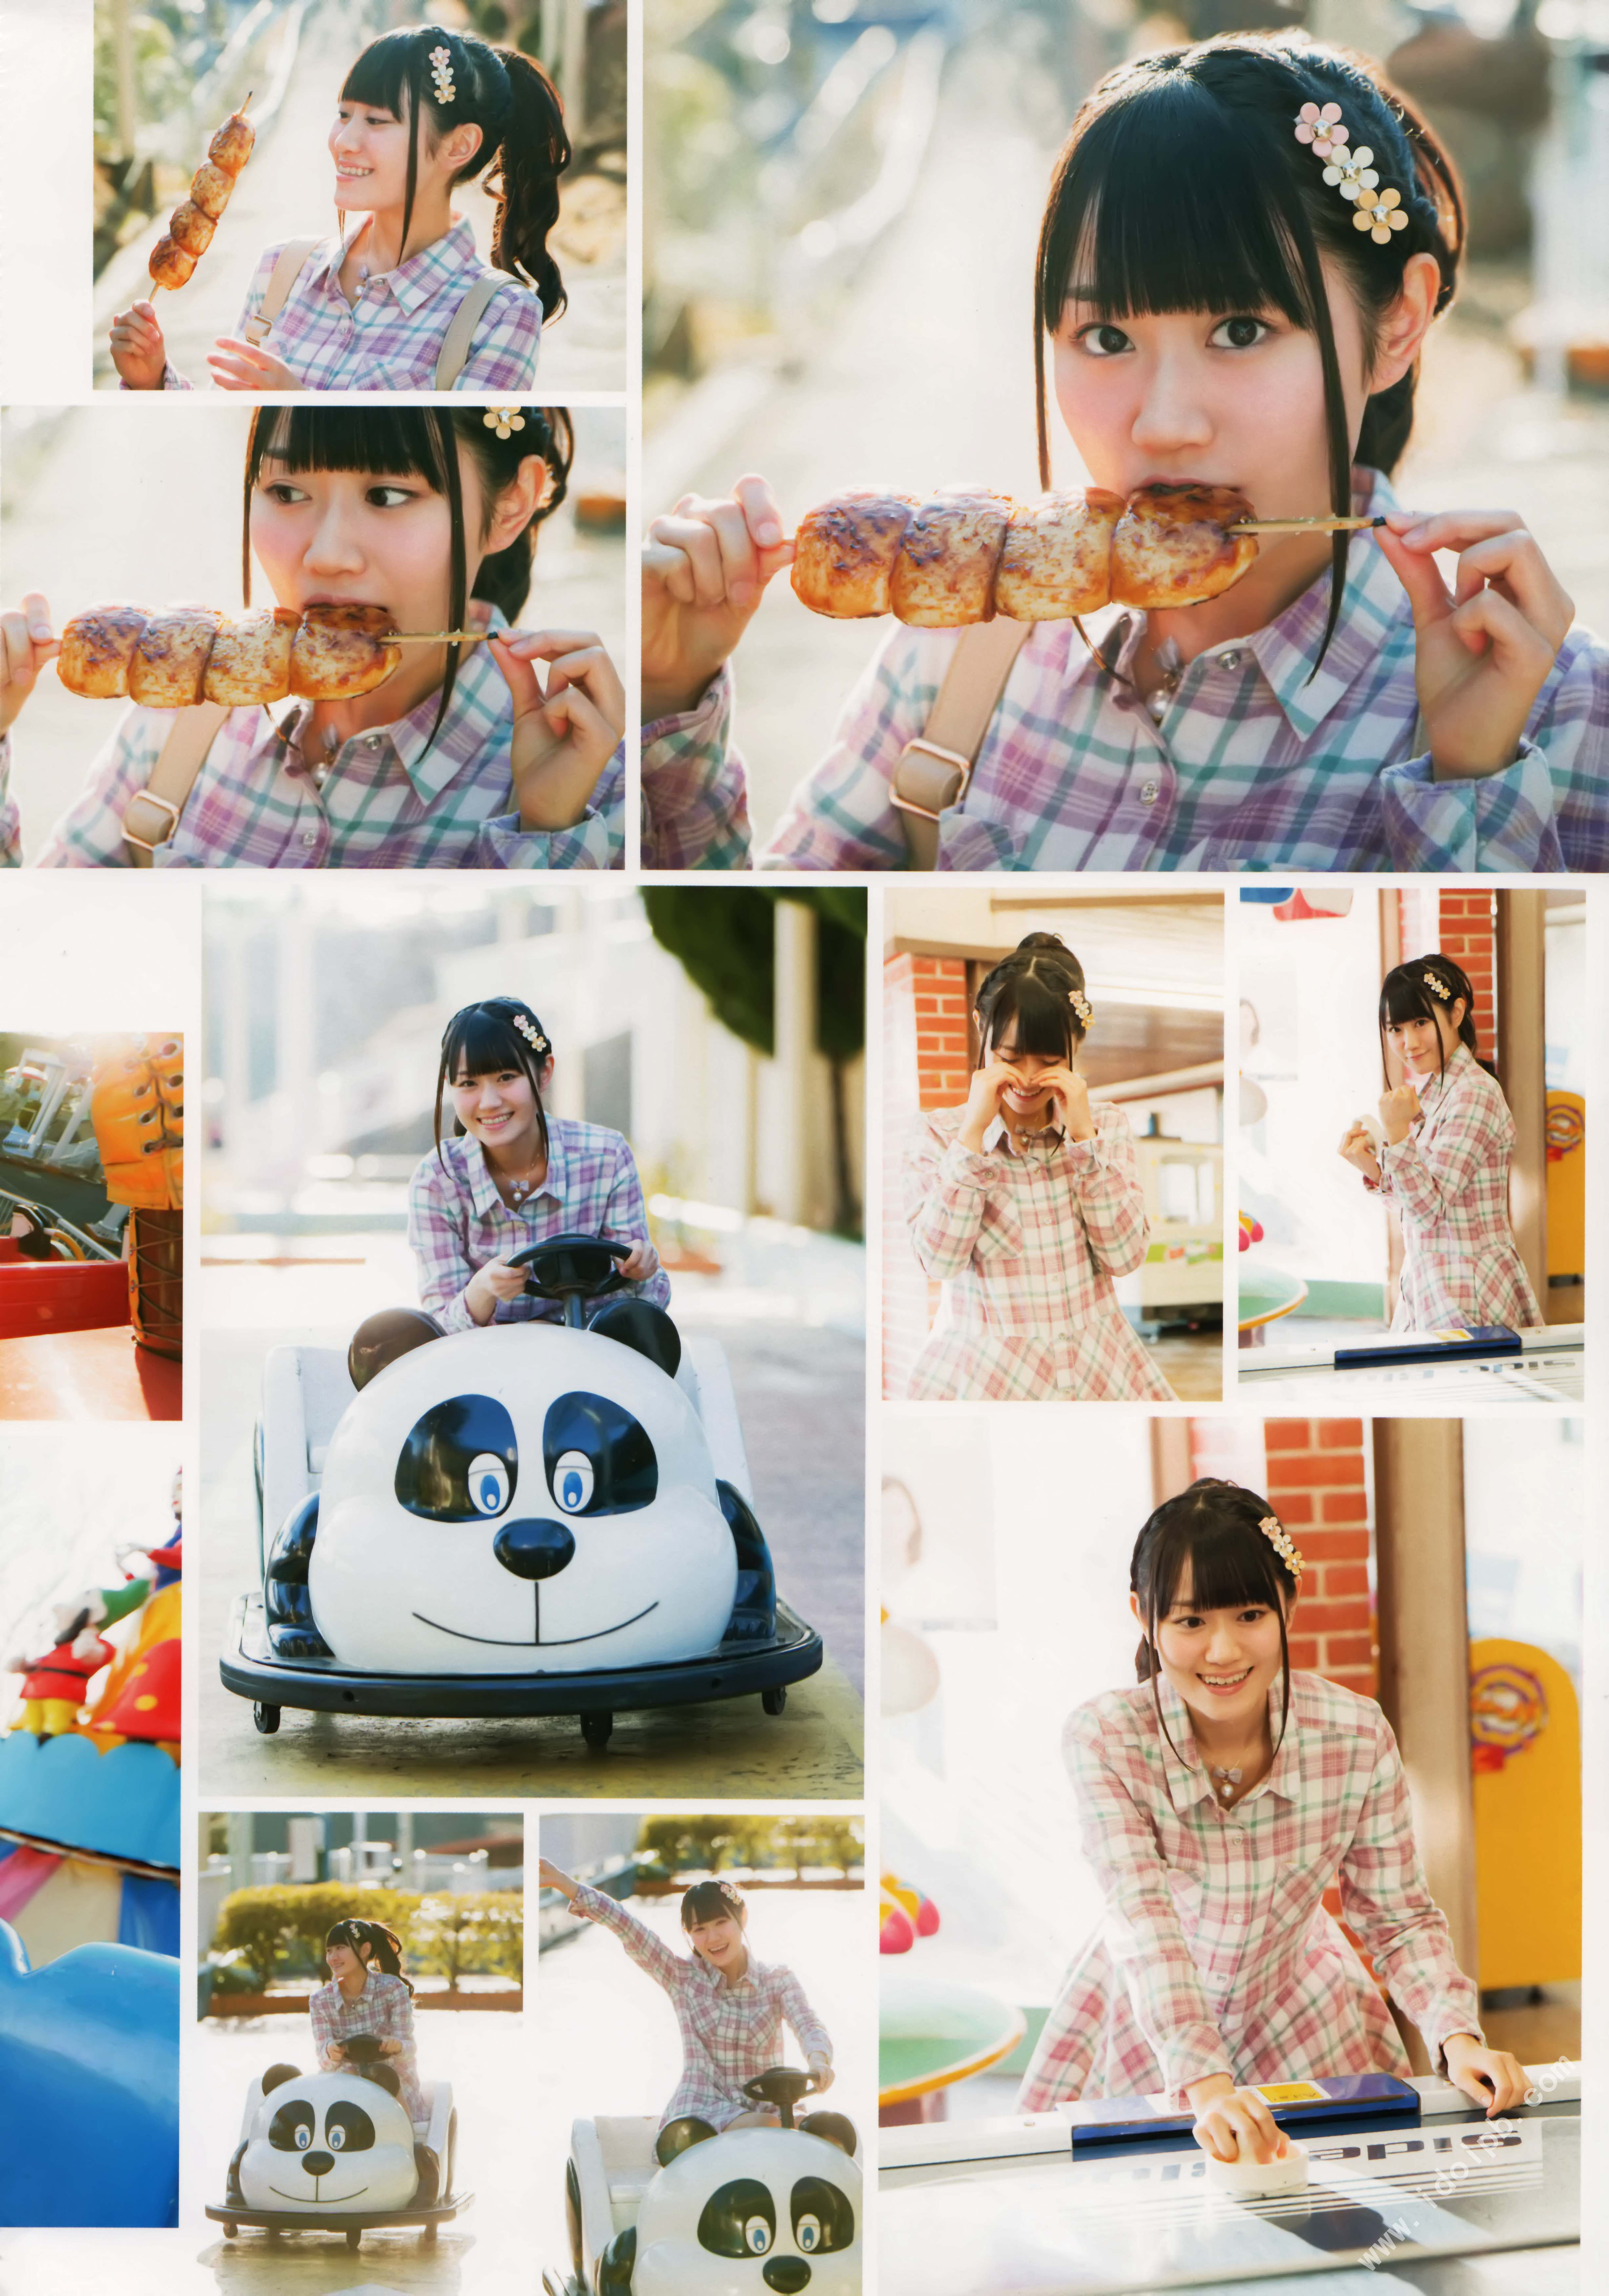 ogura_yui084.jpg